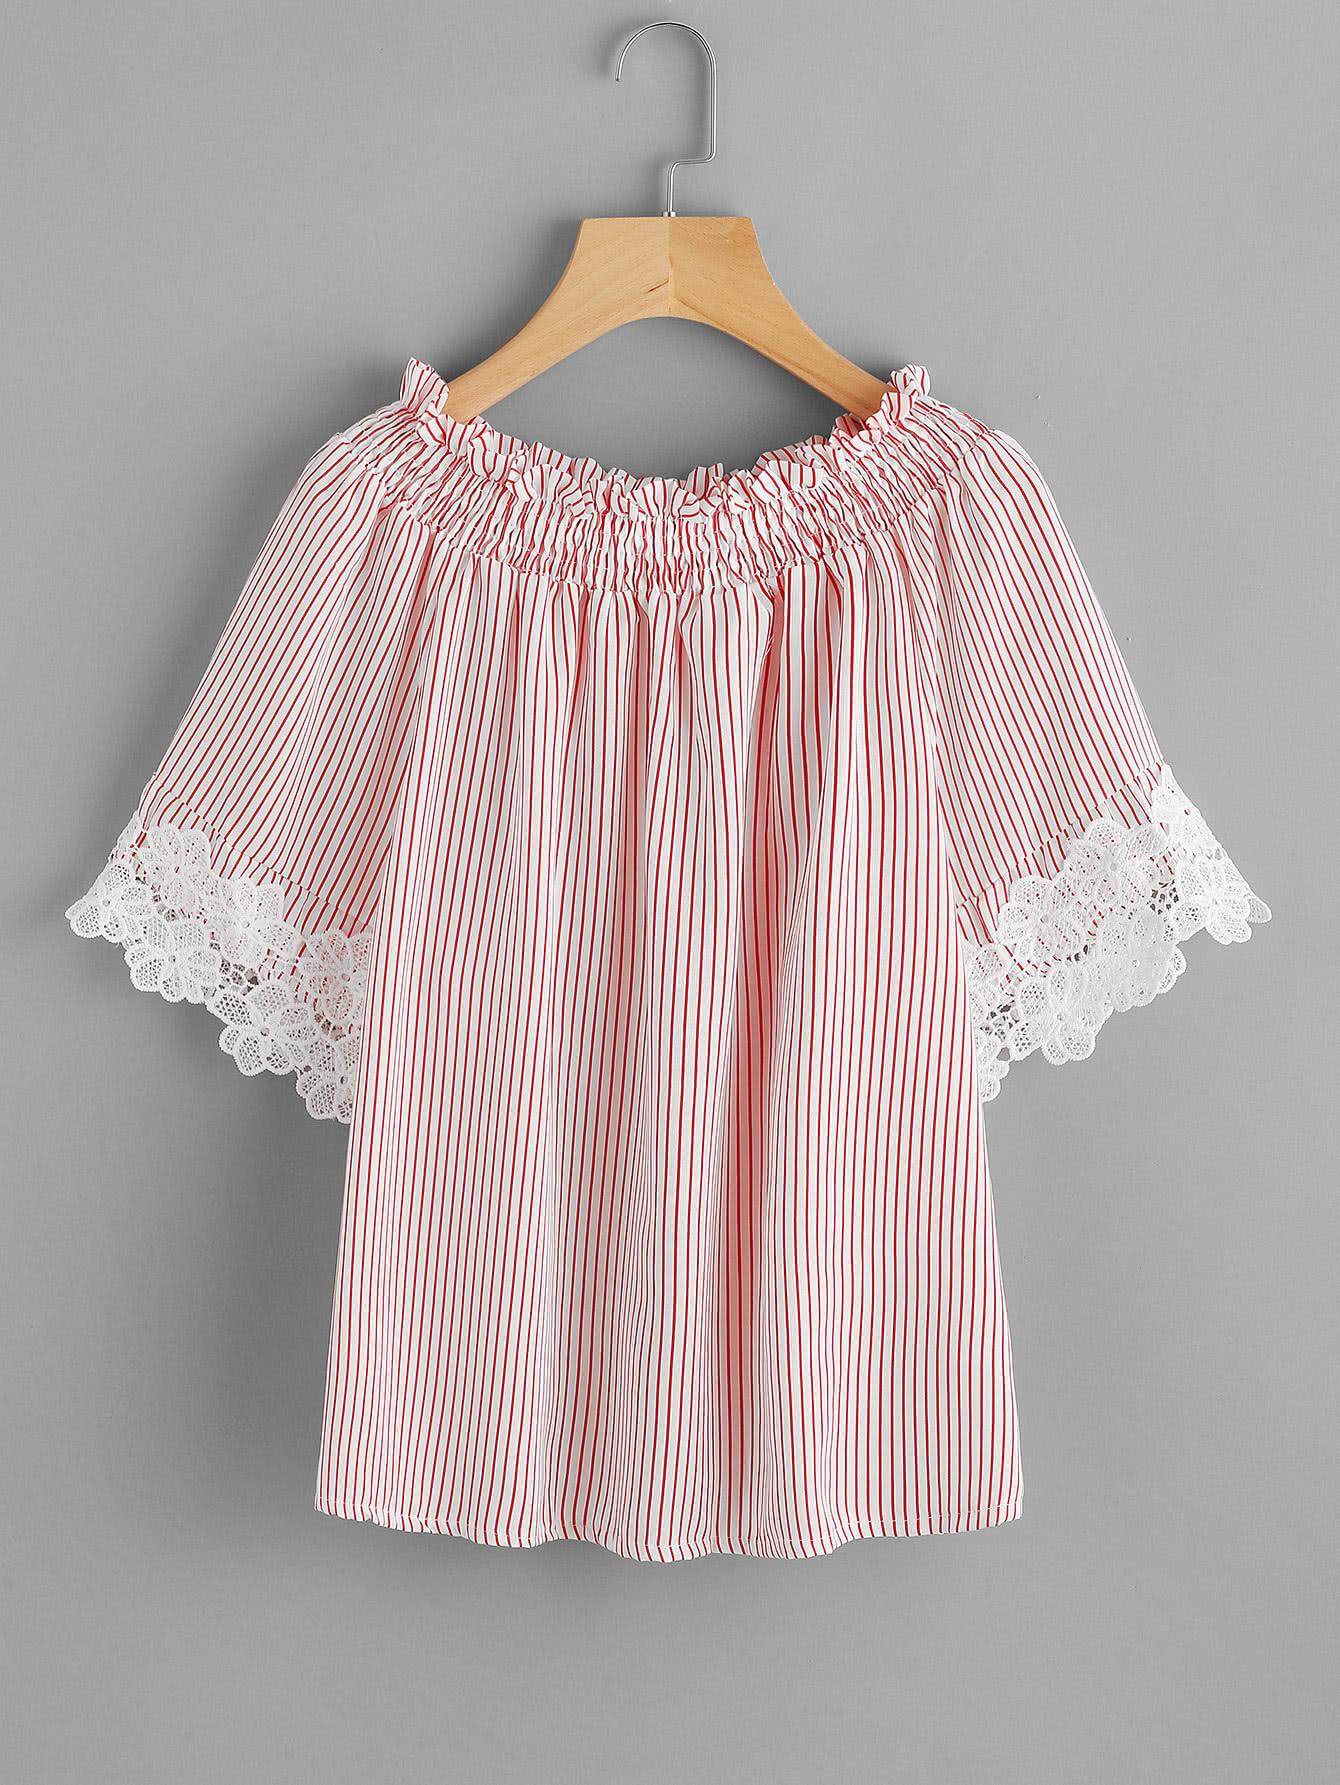 Contrast Crochet Trim Vertical Striped Frill Top blouse170728104